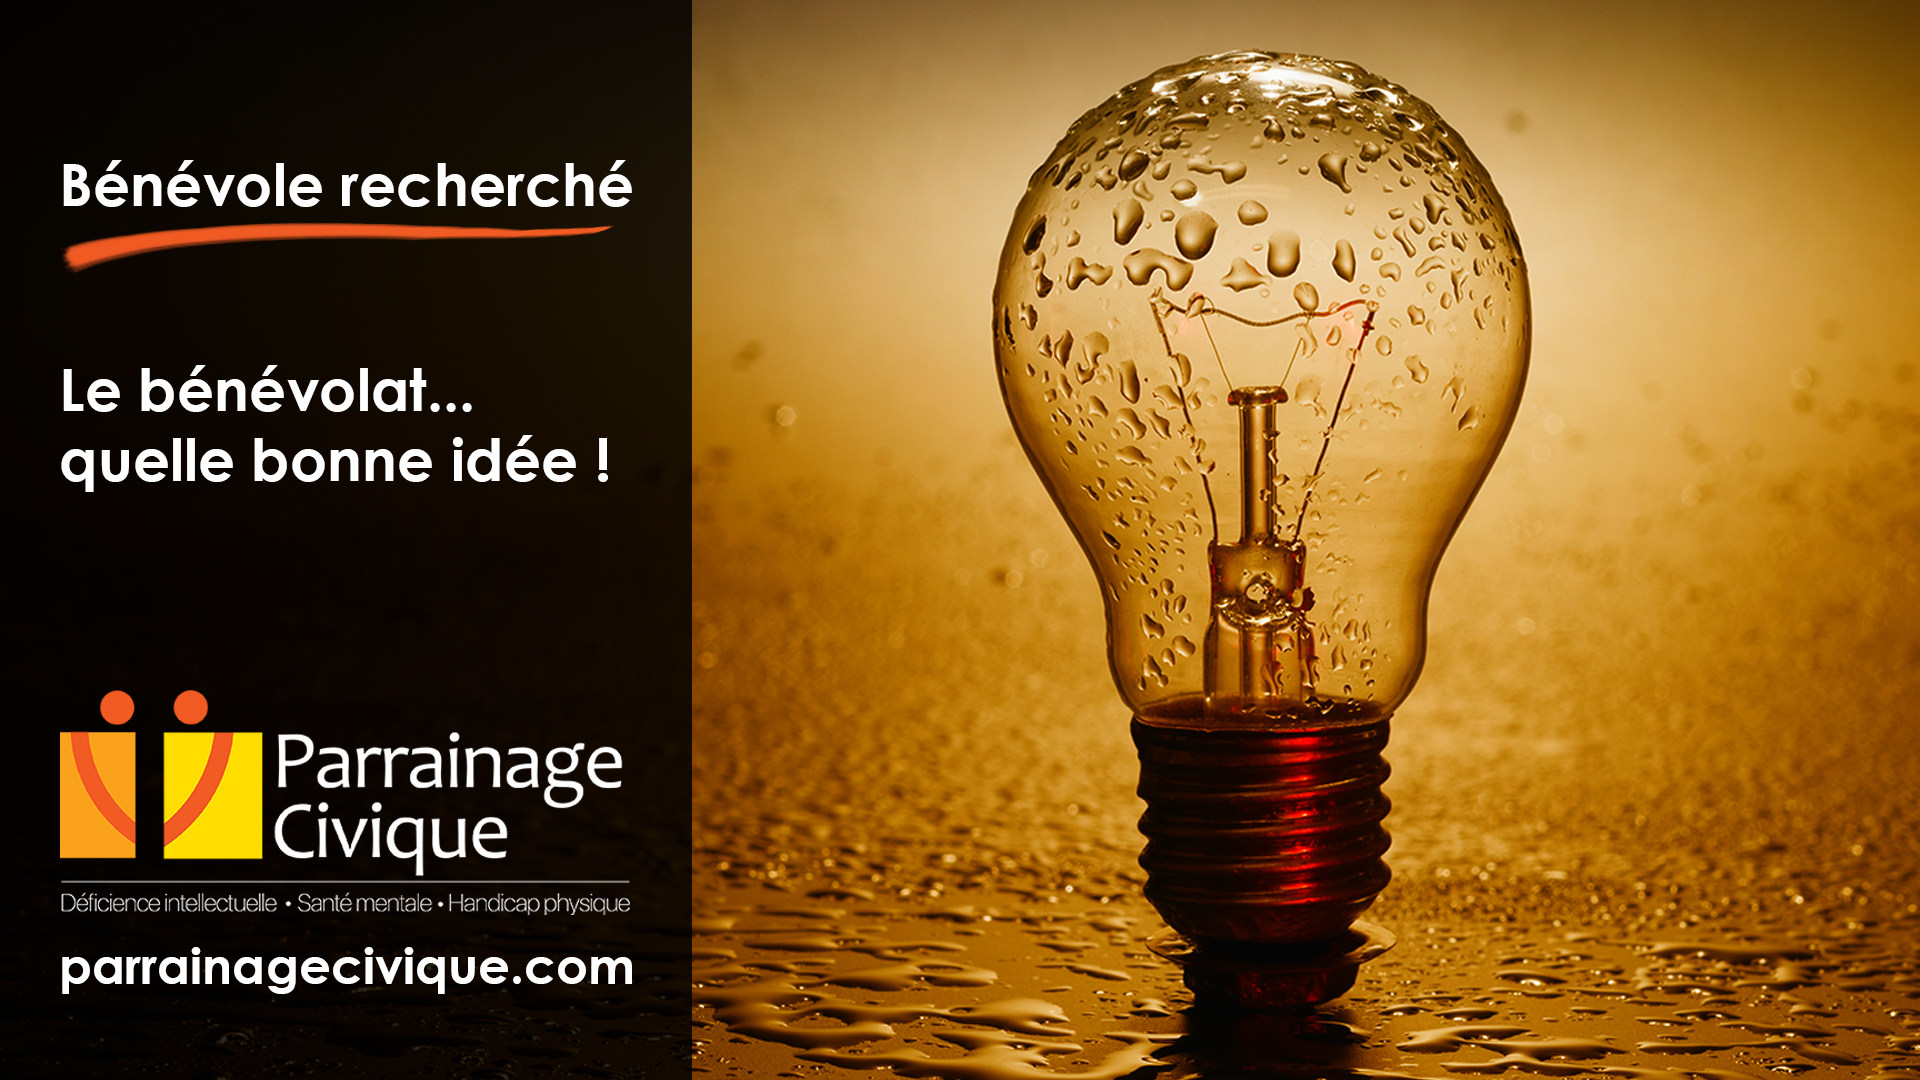 Benevole-recherche-07